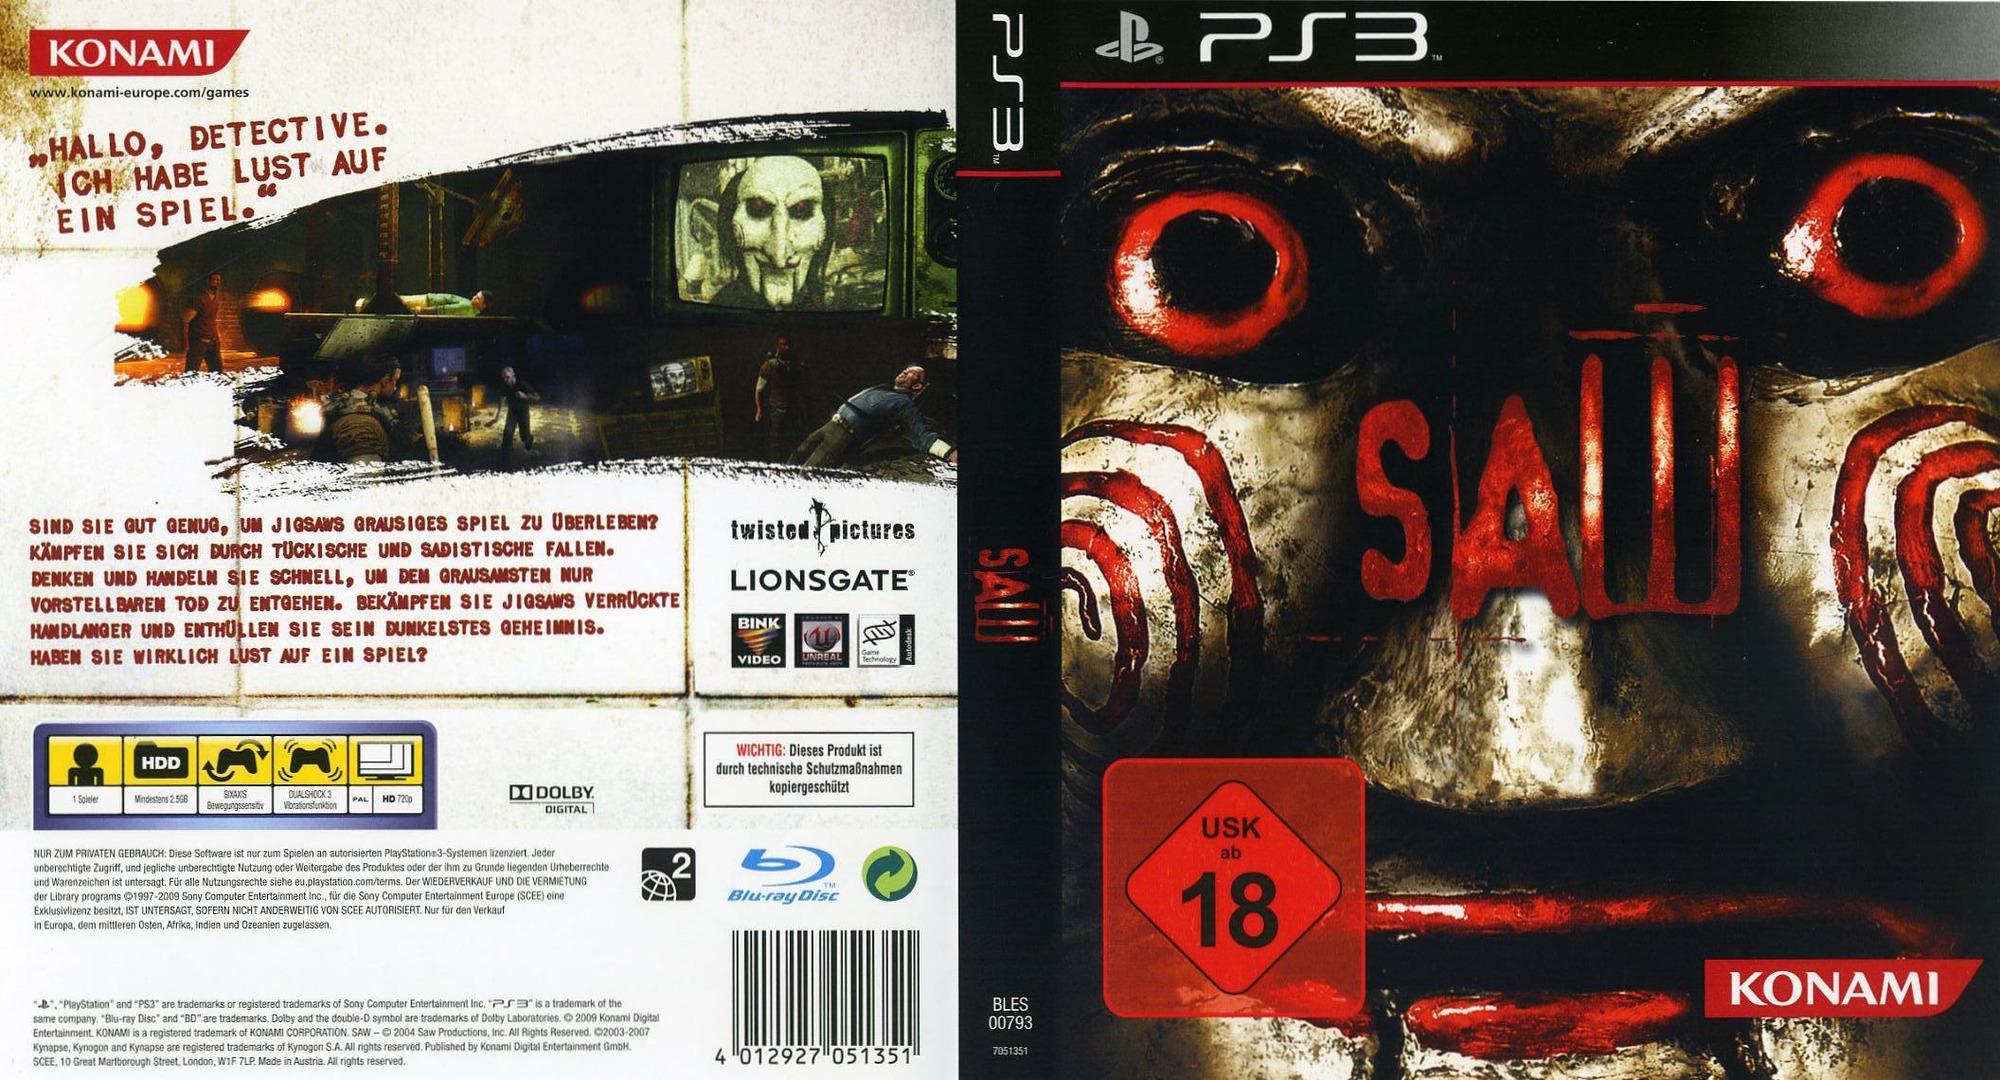 BLES00793 - Saw